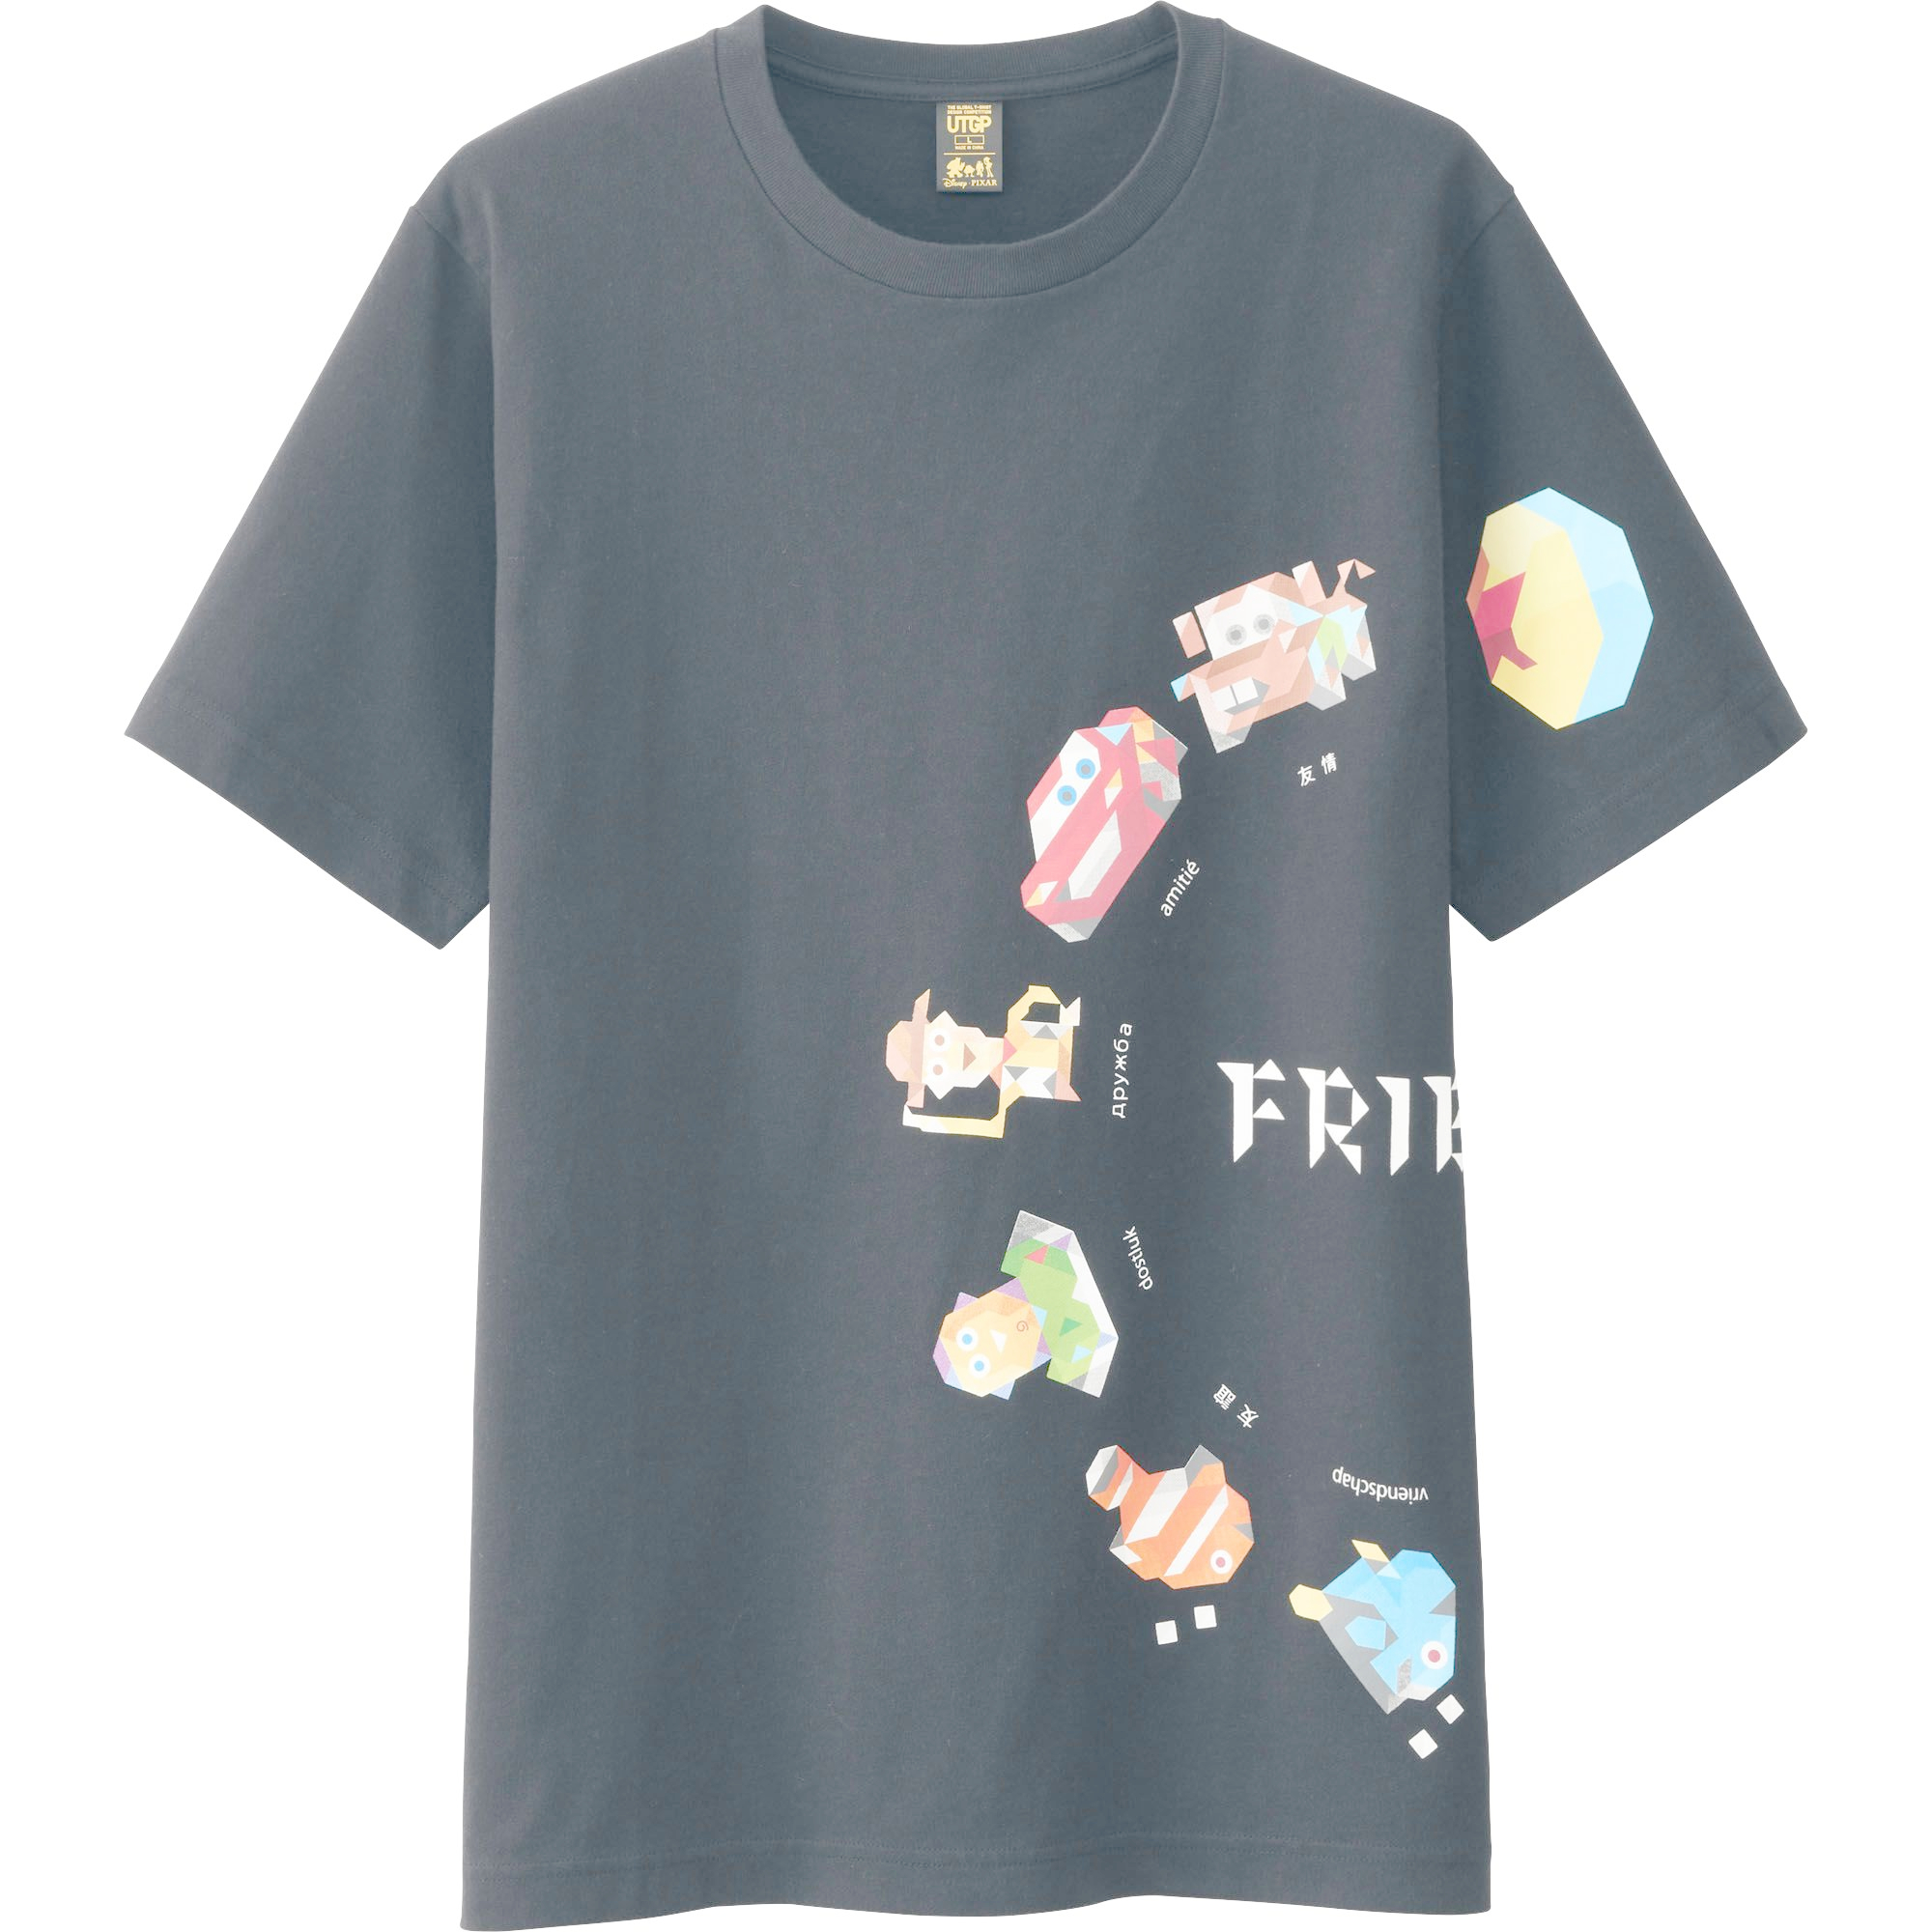 Uniqlo men 39 s utgp pixar graphic tee in black for men lyst for Uniqlo t shirt sizing